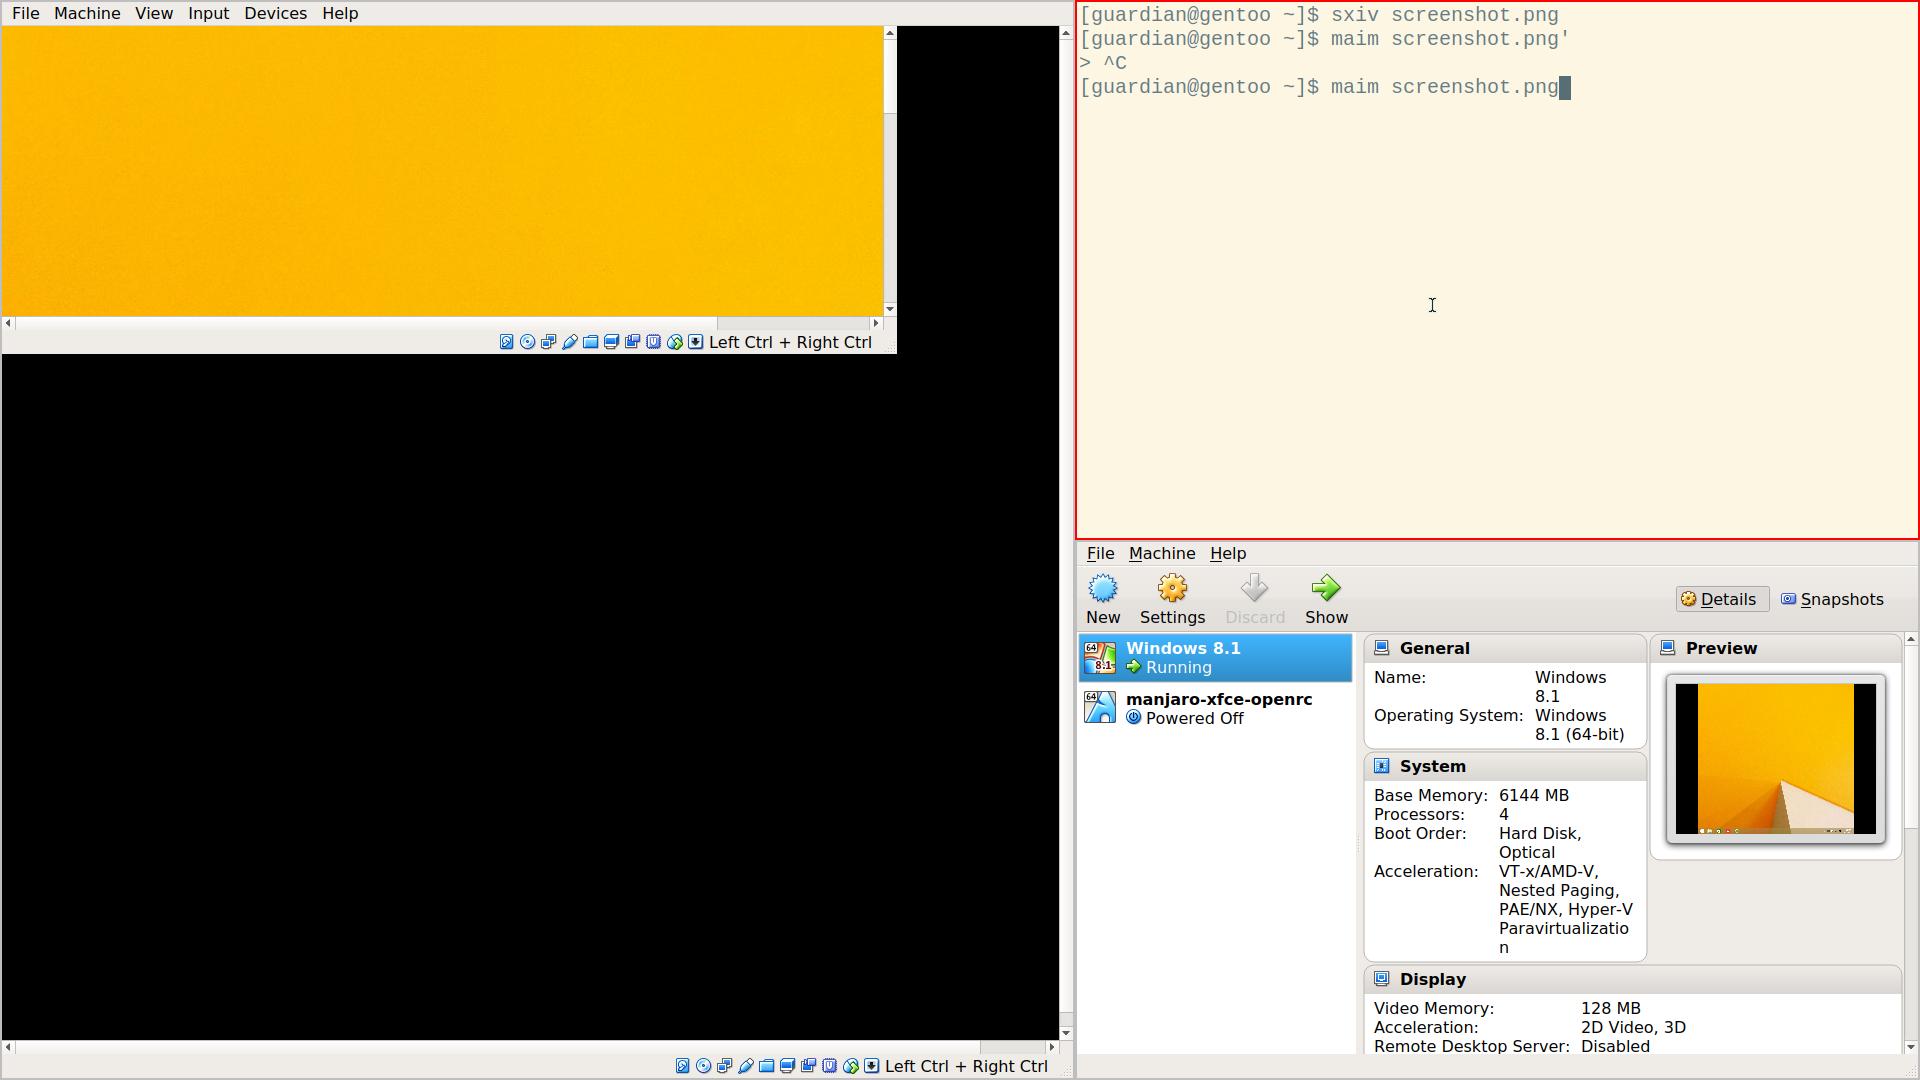 VirtualBox windows become distorted on XMonad  · Issue #146 · xmonad